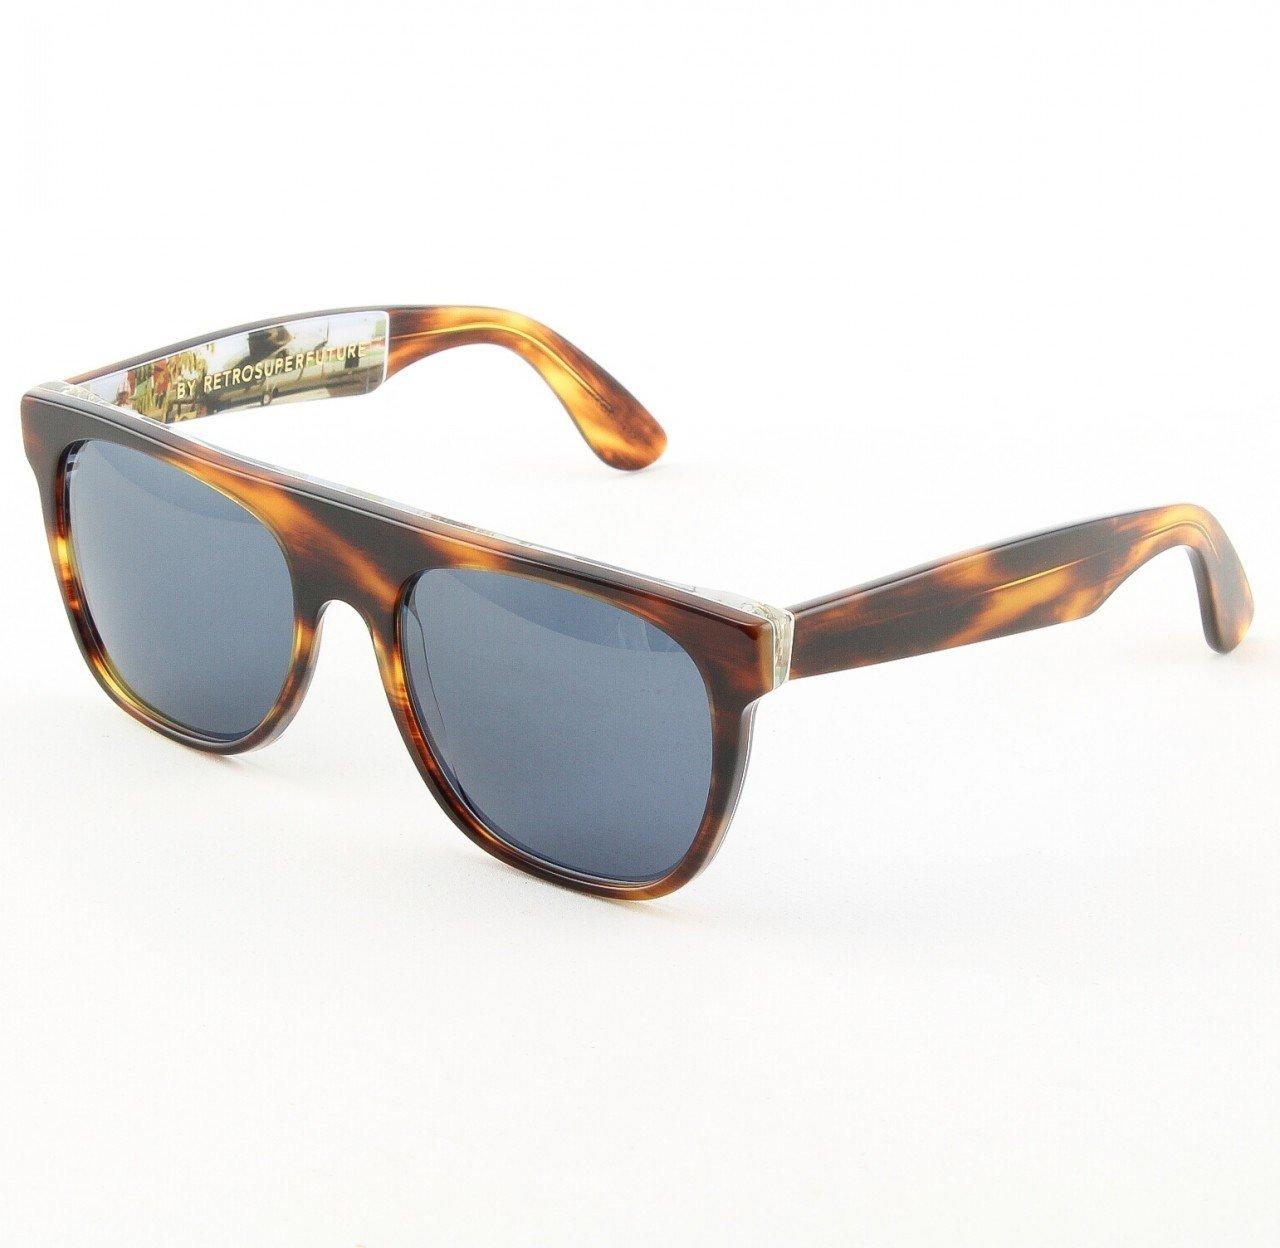 Super Flat Top 944/2T Sunglasses Color Remember Flight Brown Havana Wall Paper by RETROSUPERFUTURE